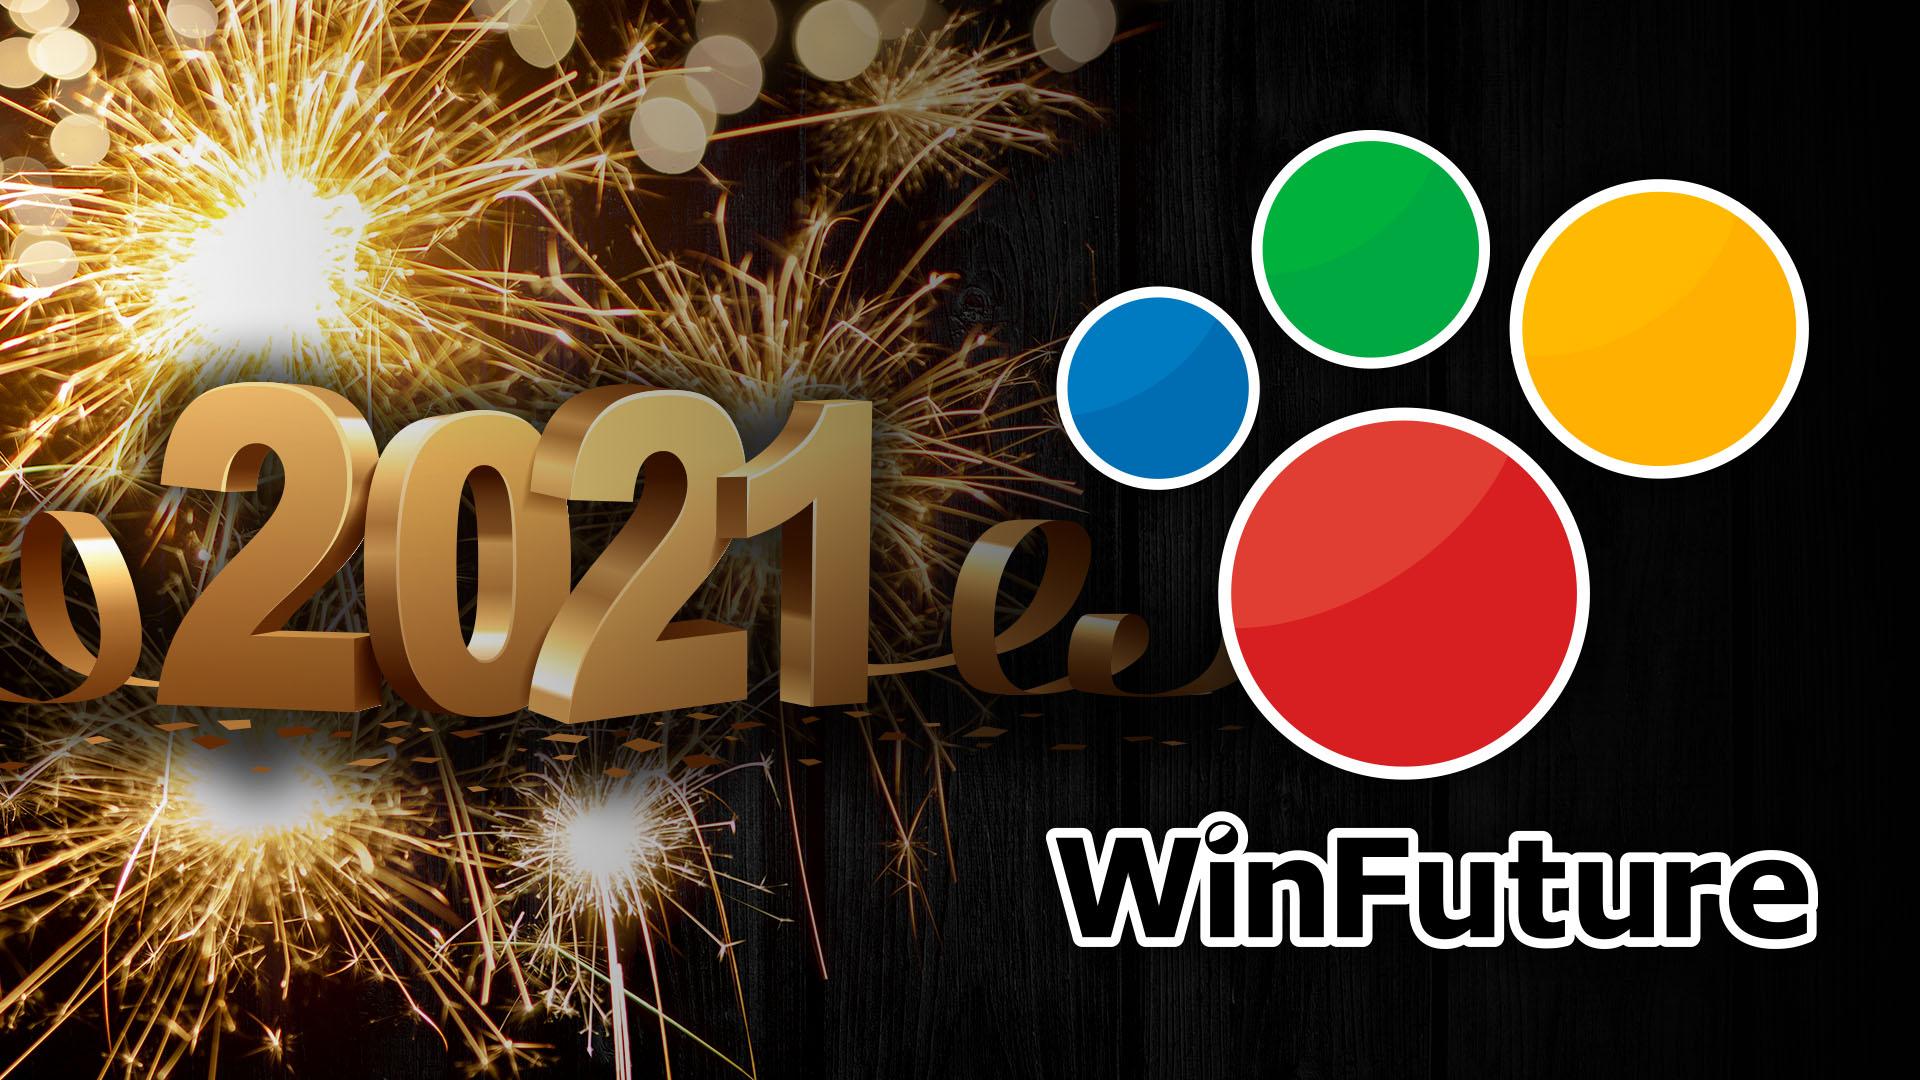 Winfuture, Weihnachten, Neujahr, 2020, Xmas, 2021, Christmas, WinFuture Logo